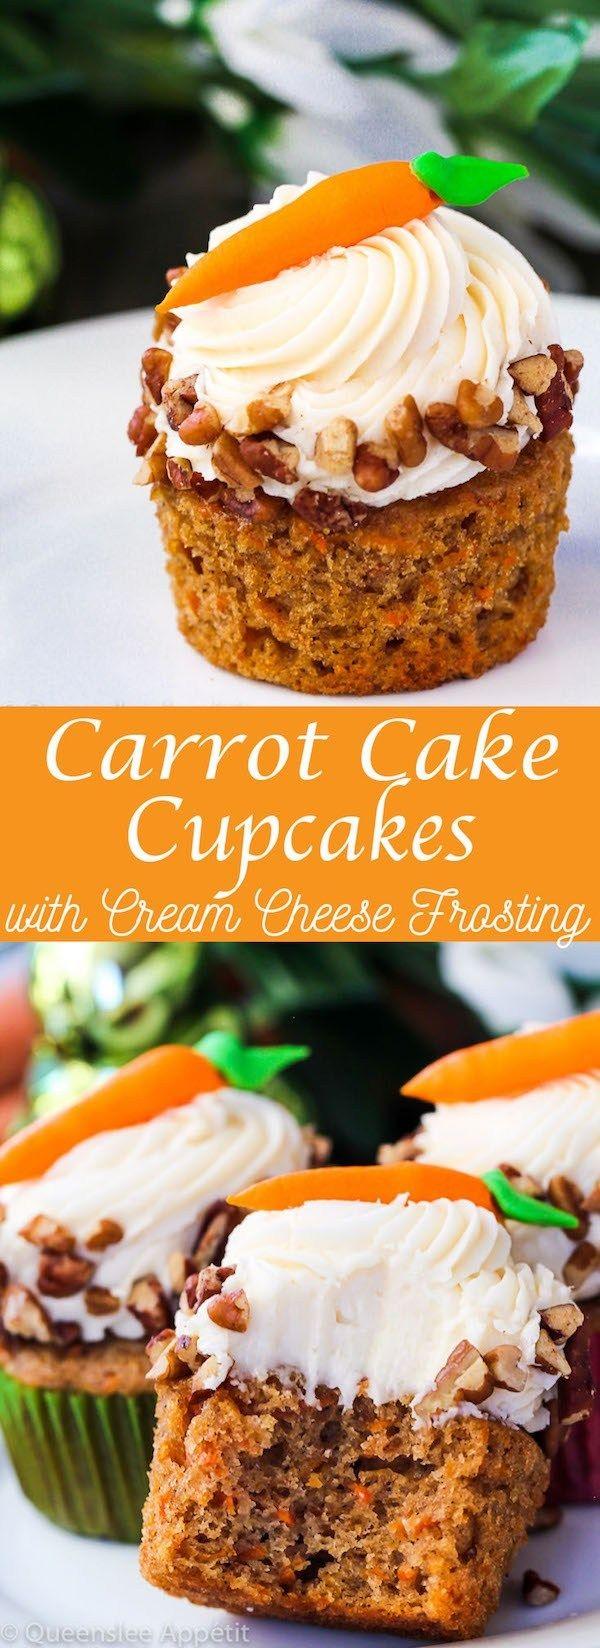 Carrot Cake Cupcakes With Cream Cheese Frosting Queenslee Appetit Cupcakes With Cream Cheese Frosting Cupcake Recipes Desserts Siempre has oído hablar de la famosa tarta de zanahoria pero ¿nunca te has atrevido por miedo?, o la has probado pero te. pinterest